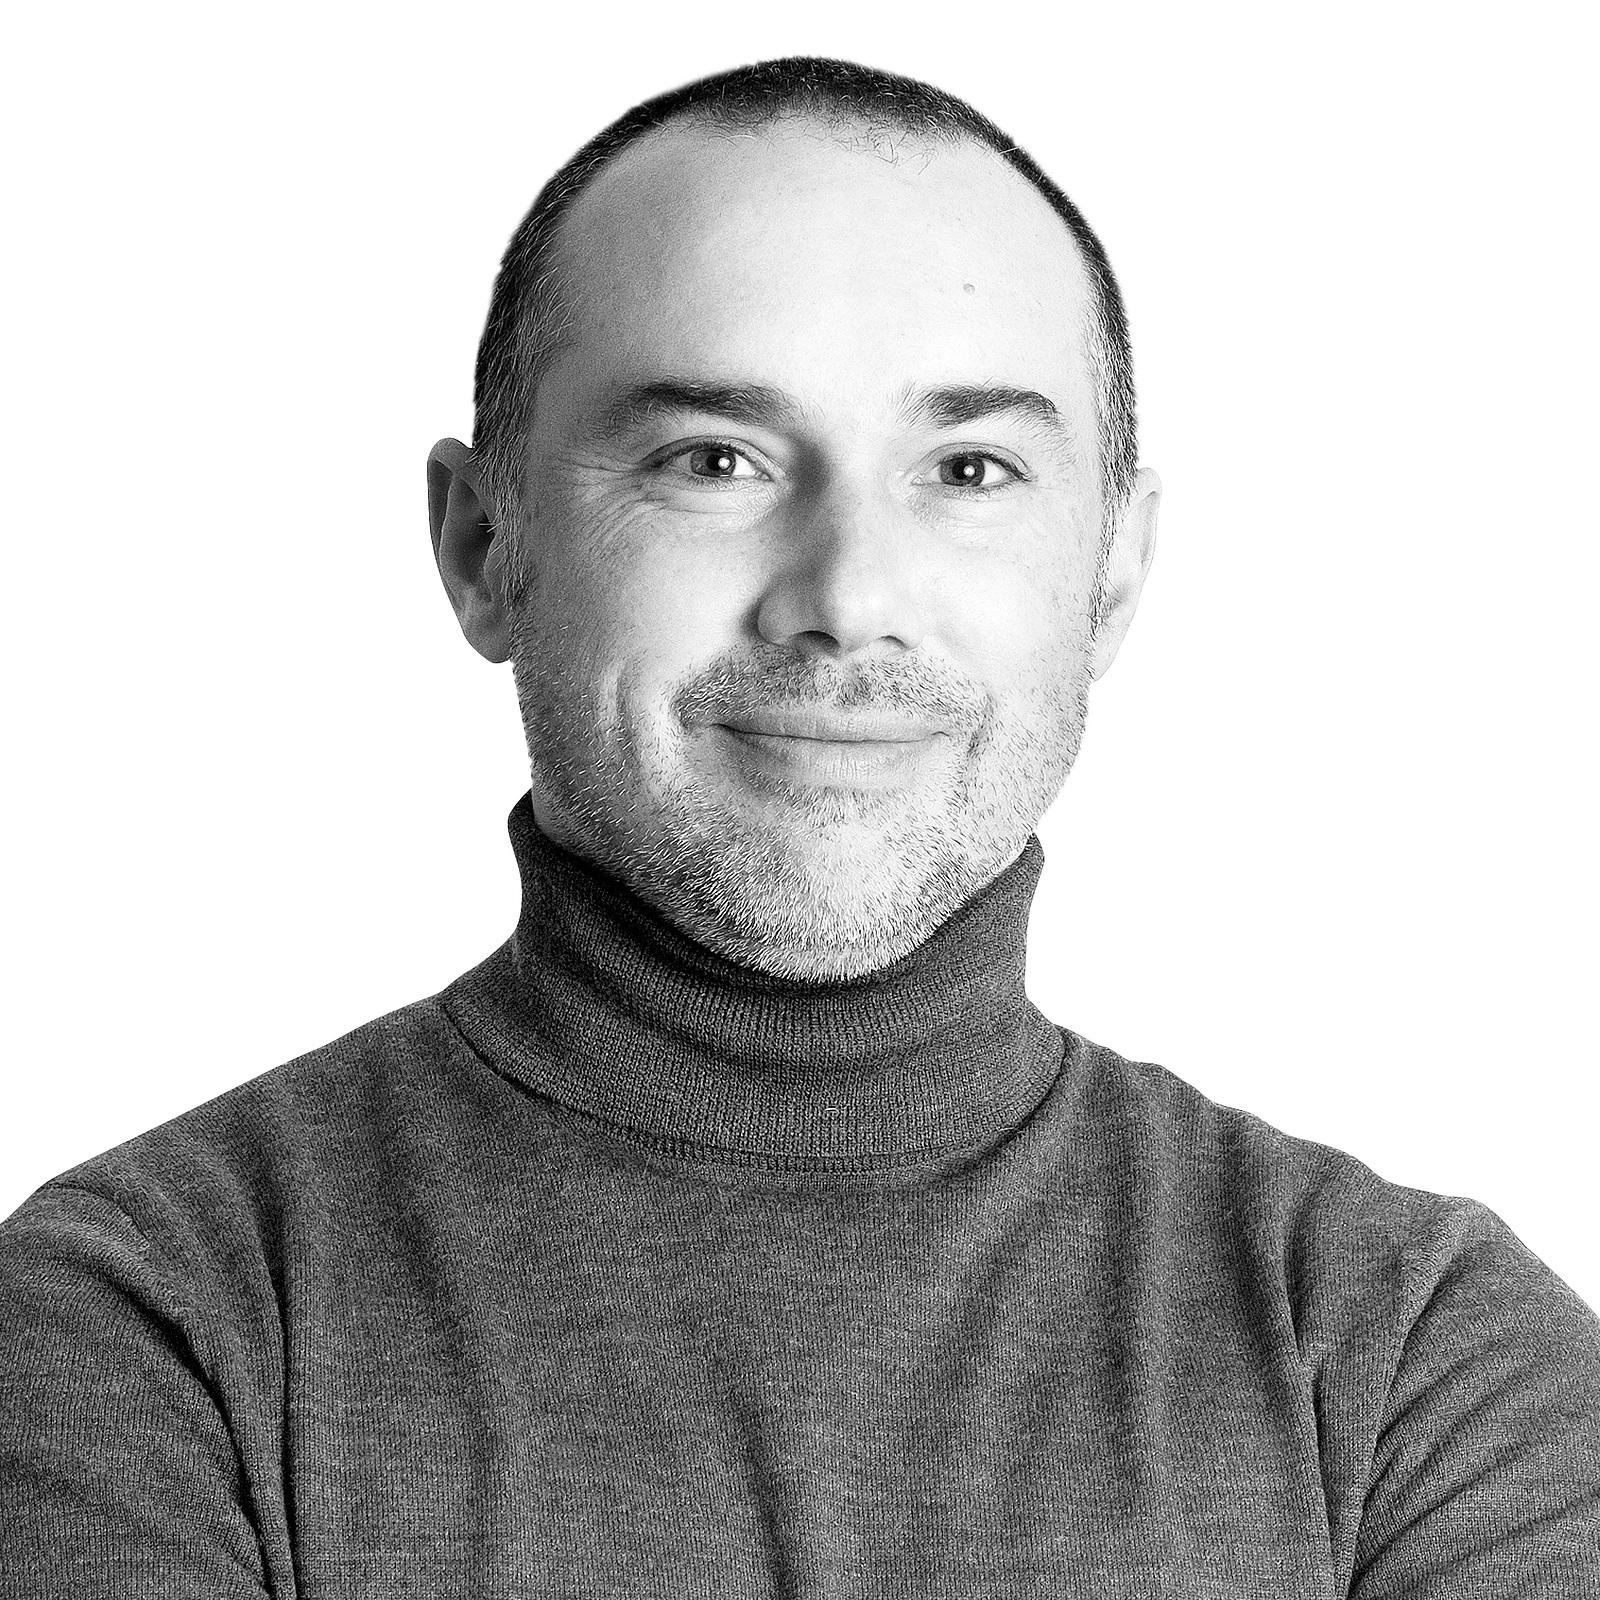 Portrait of Dimitrij Drus